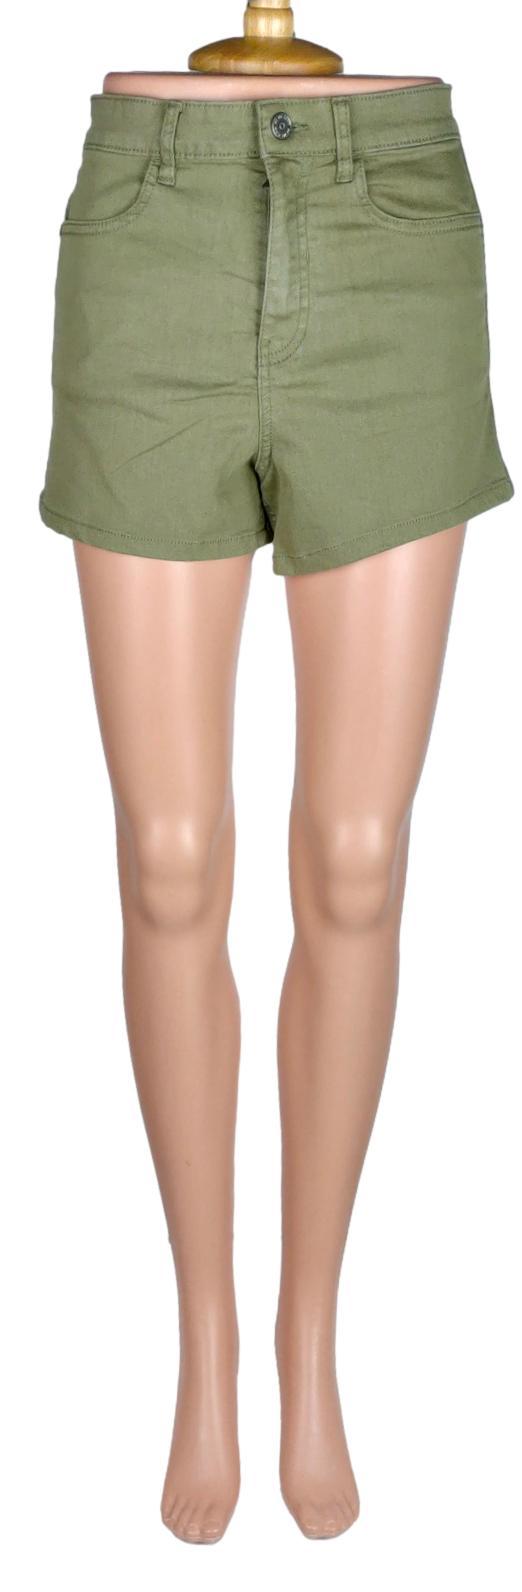 Short Jennyfer - Taille 34